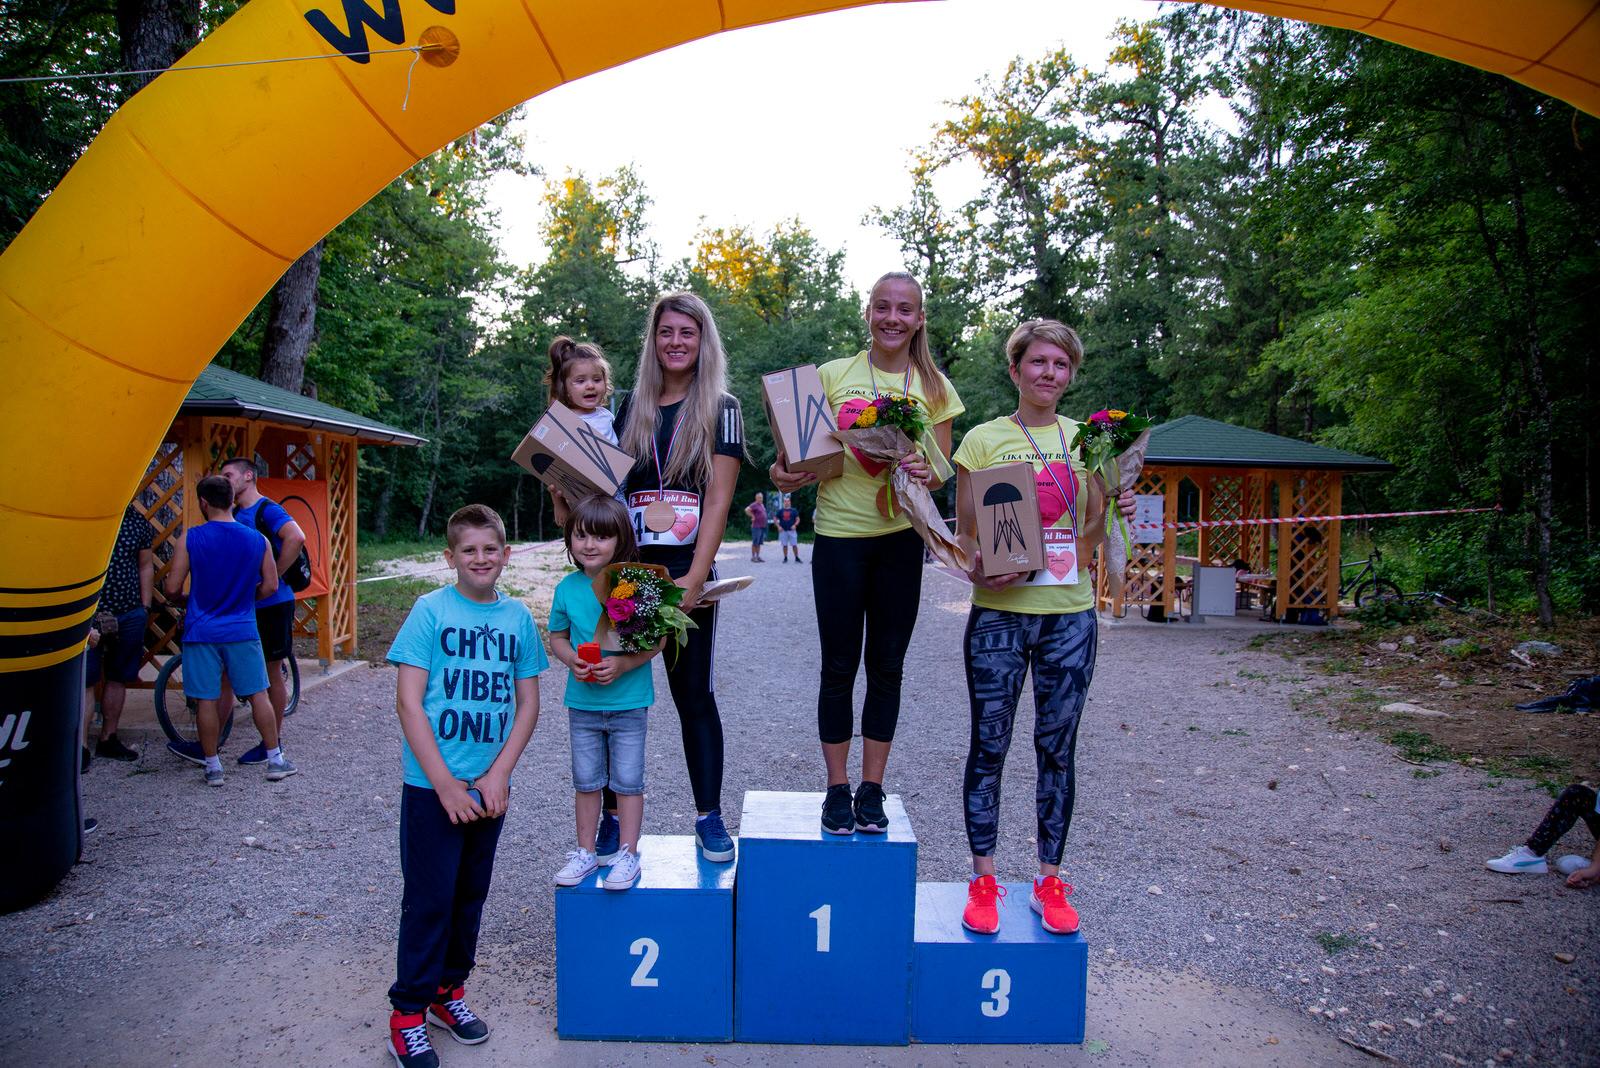 likaclub_lika night run_jasikovac_7_2020 (20)